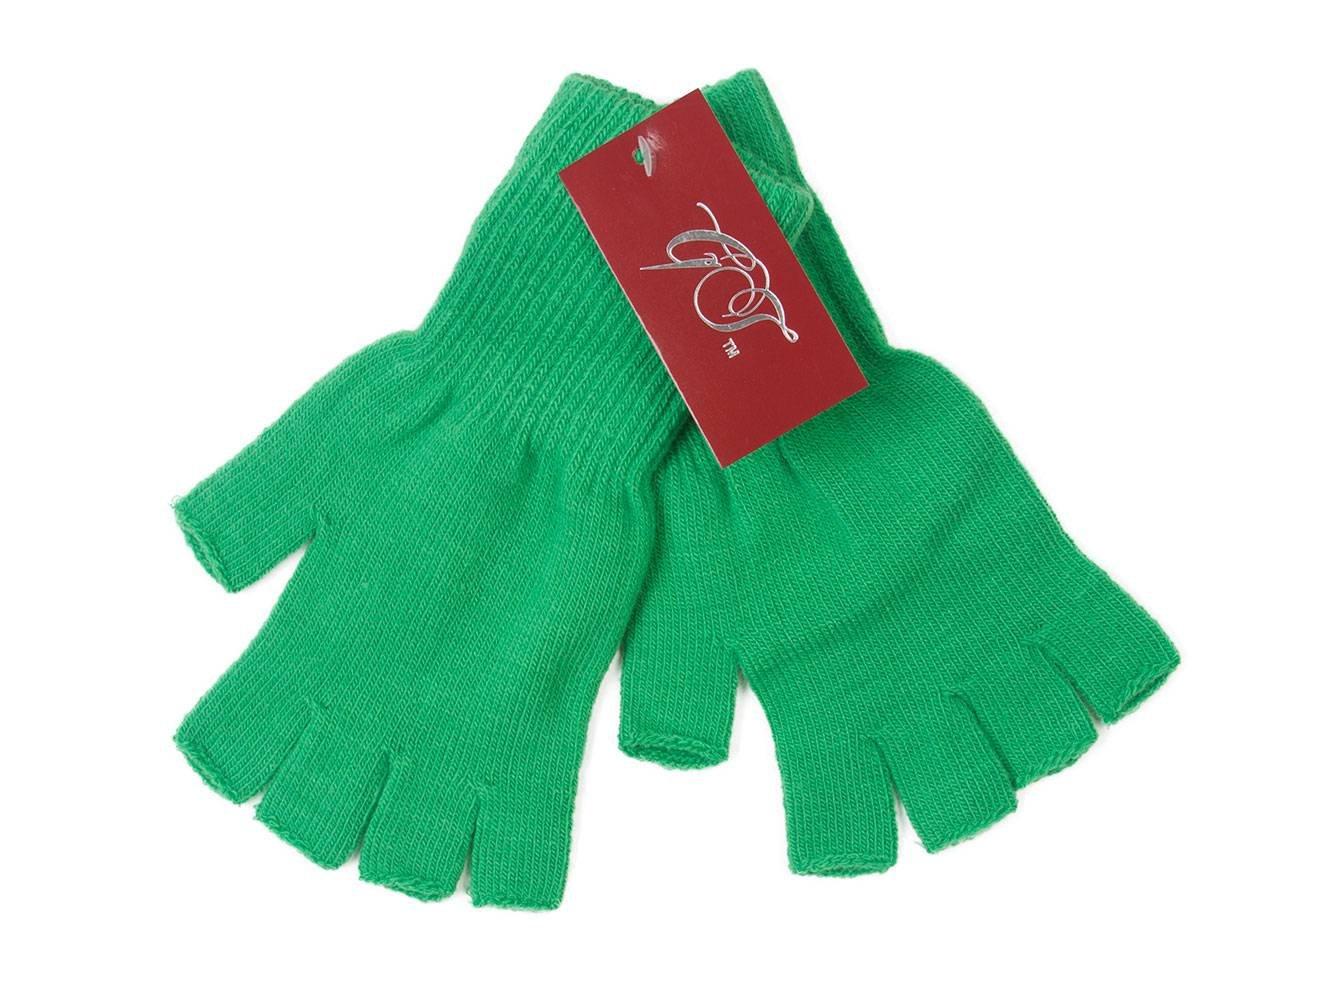 Gravity Threads Unisex Warm Half Finger Stretchy Knit Gloves Black Gravity Trading